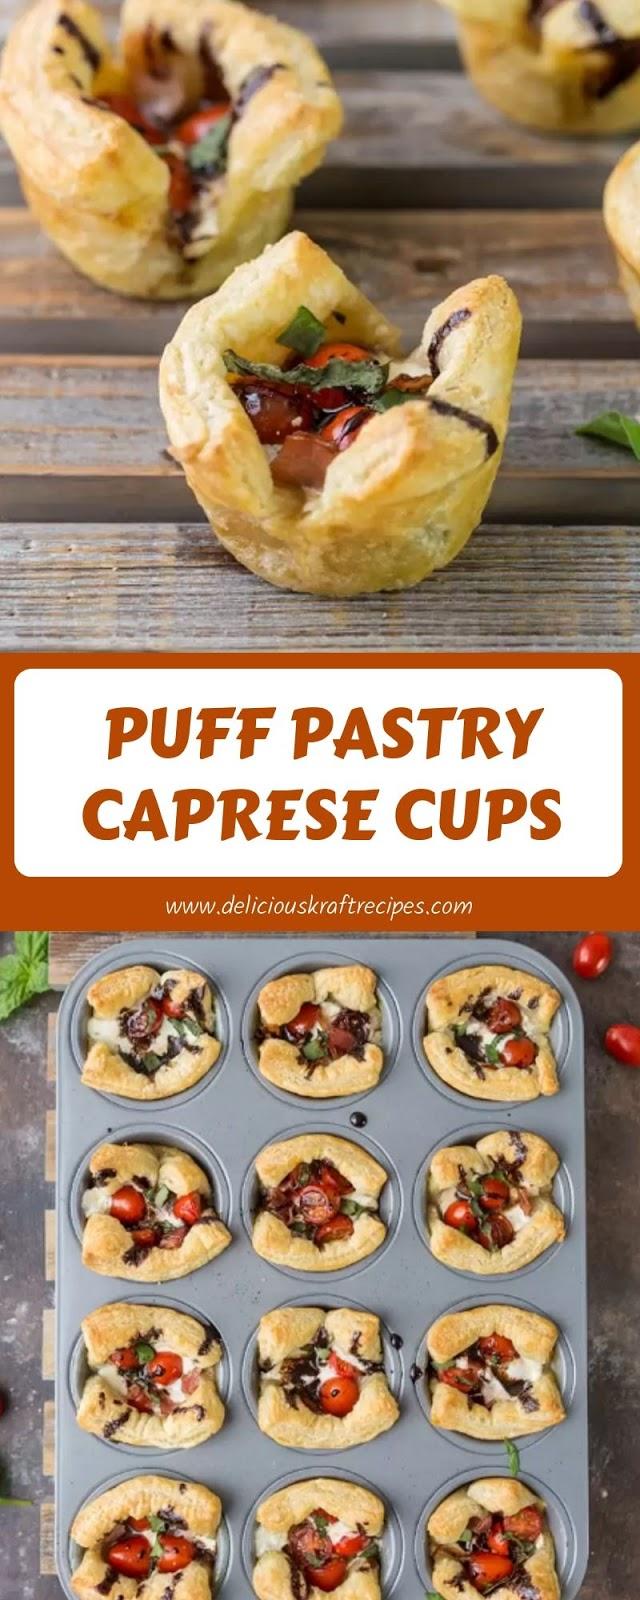 PUFF PASTRY CAPRESE CUPS